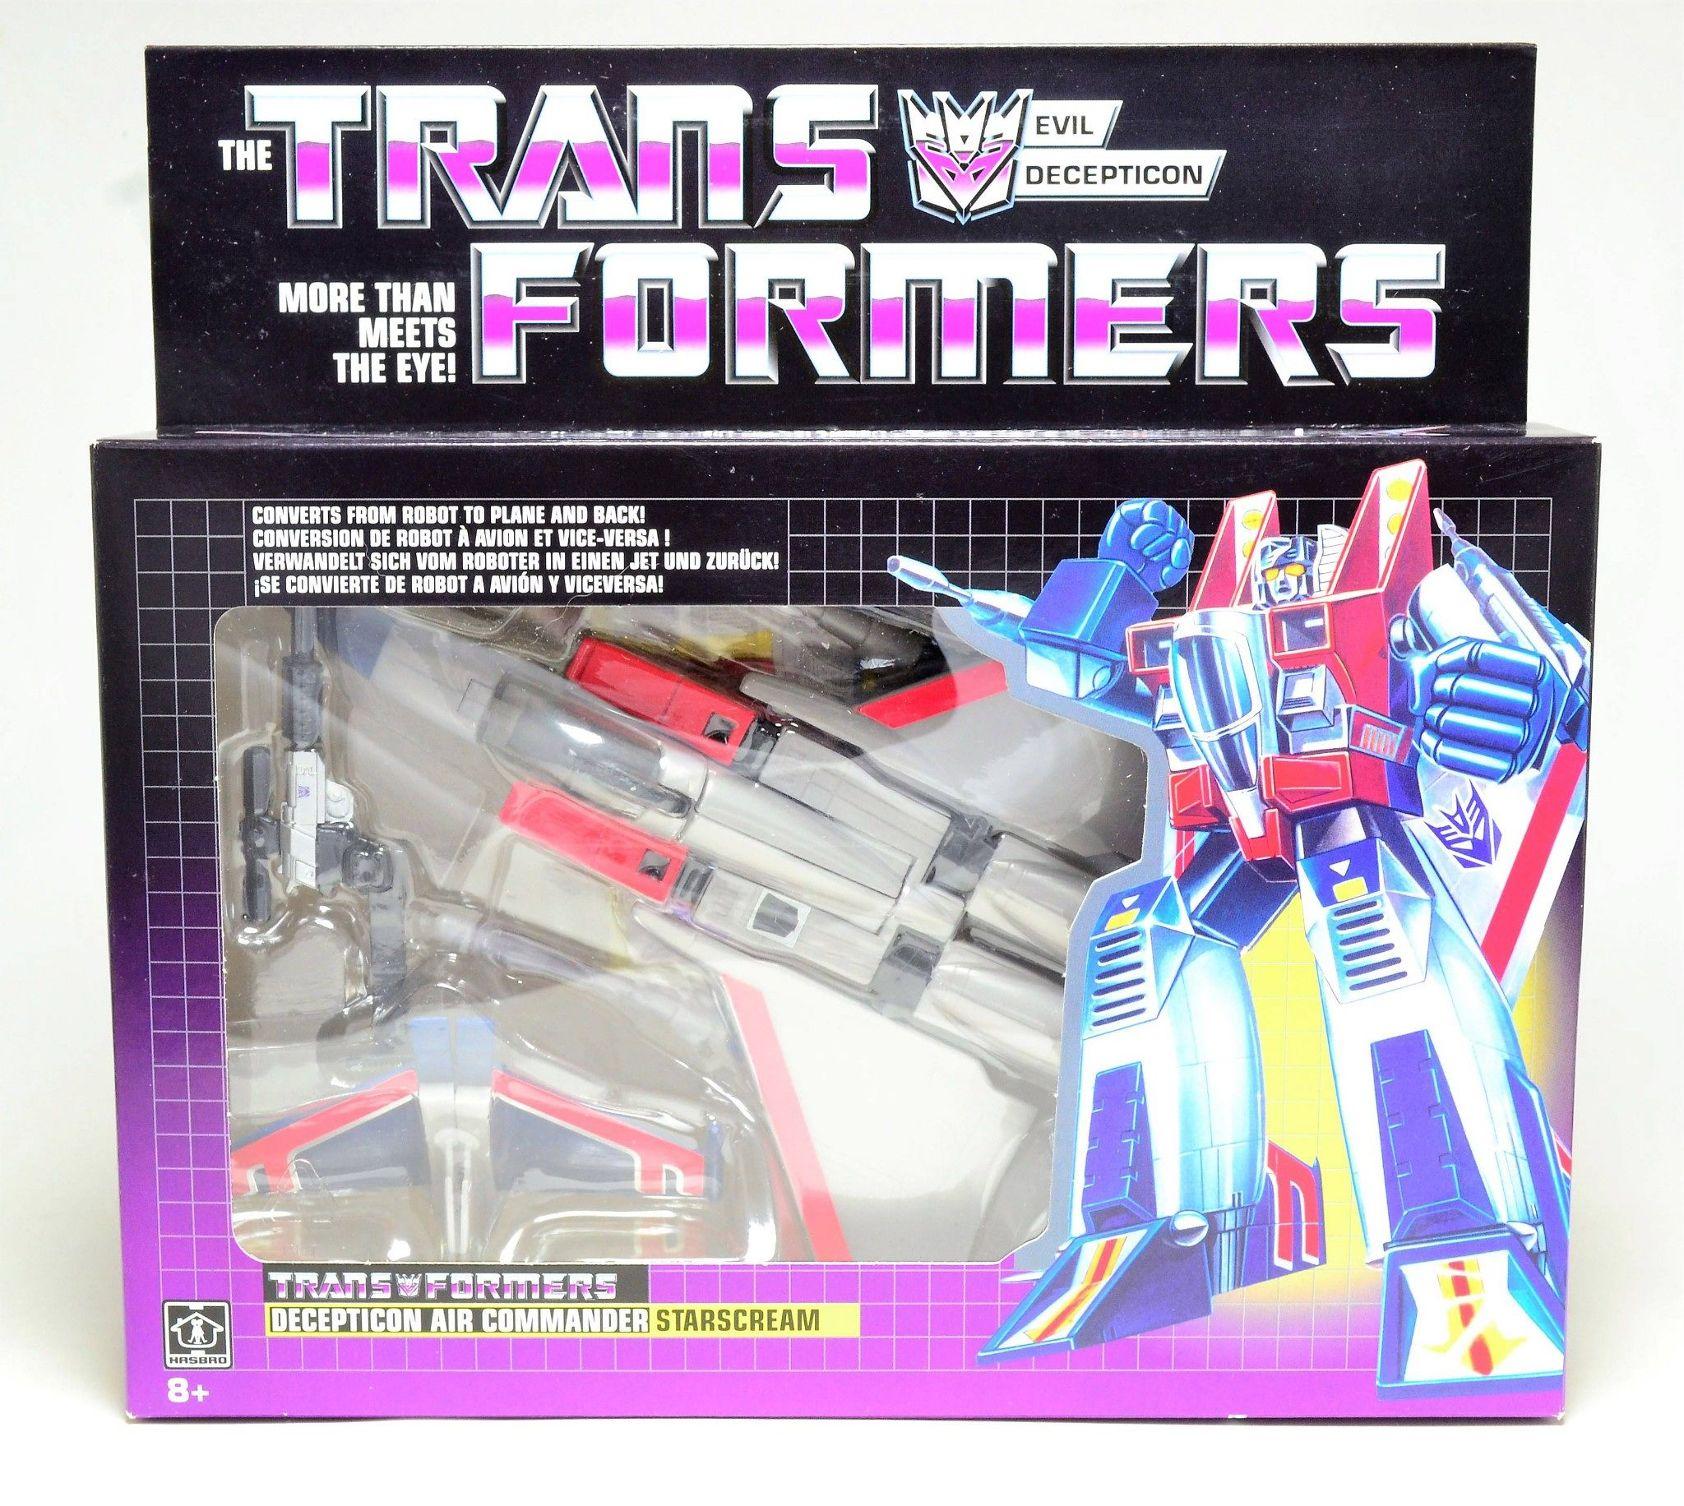 Transformers E2054 Vintage Exclusif G1 Starscream Action Figure Toy